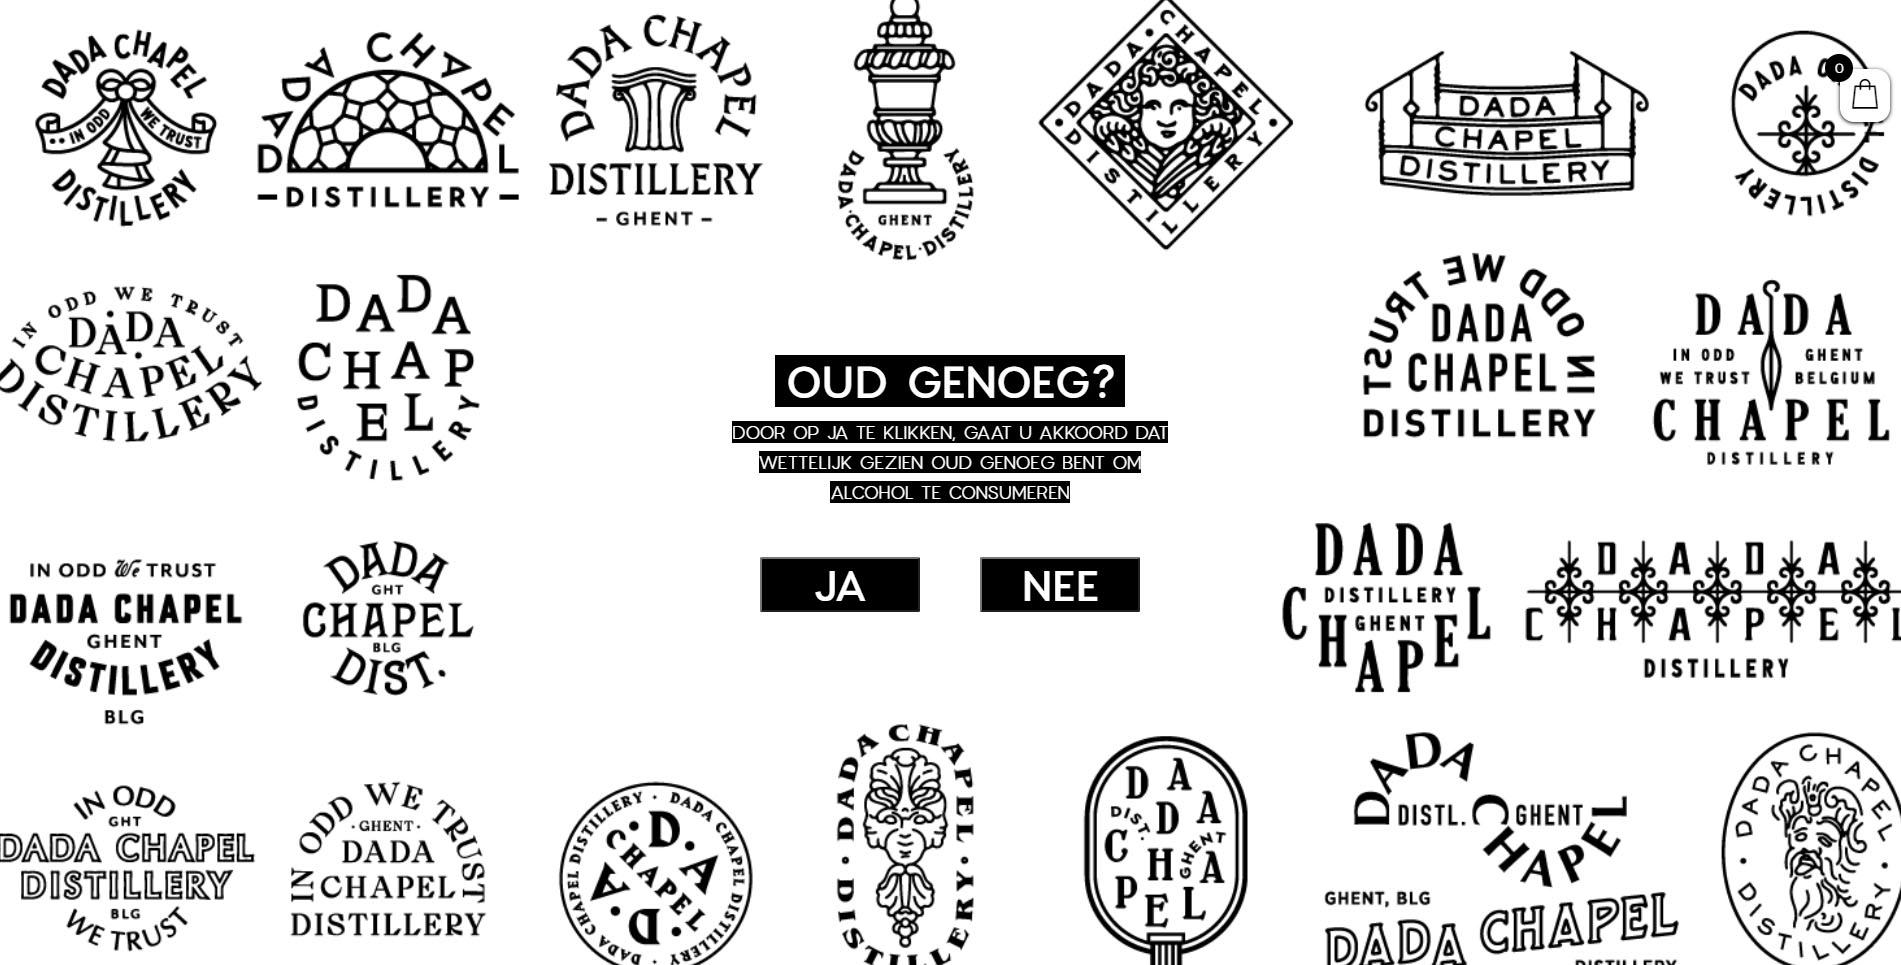 DADA Chapel Distillery